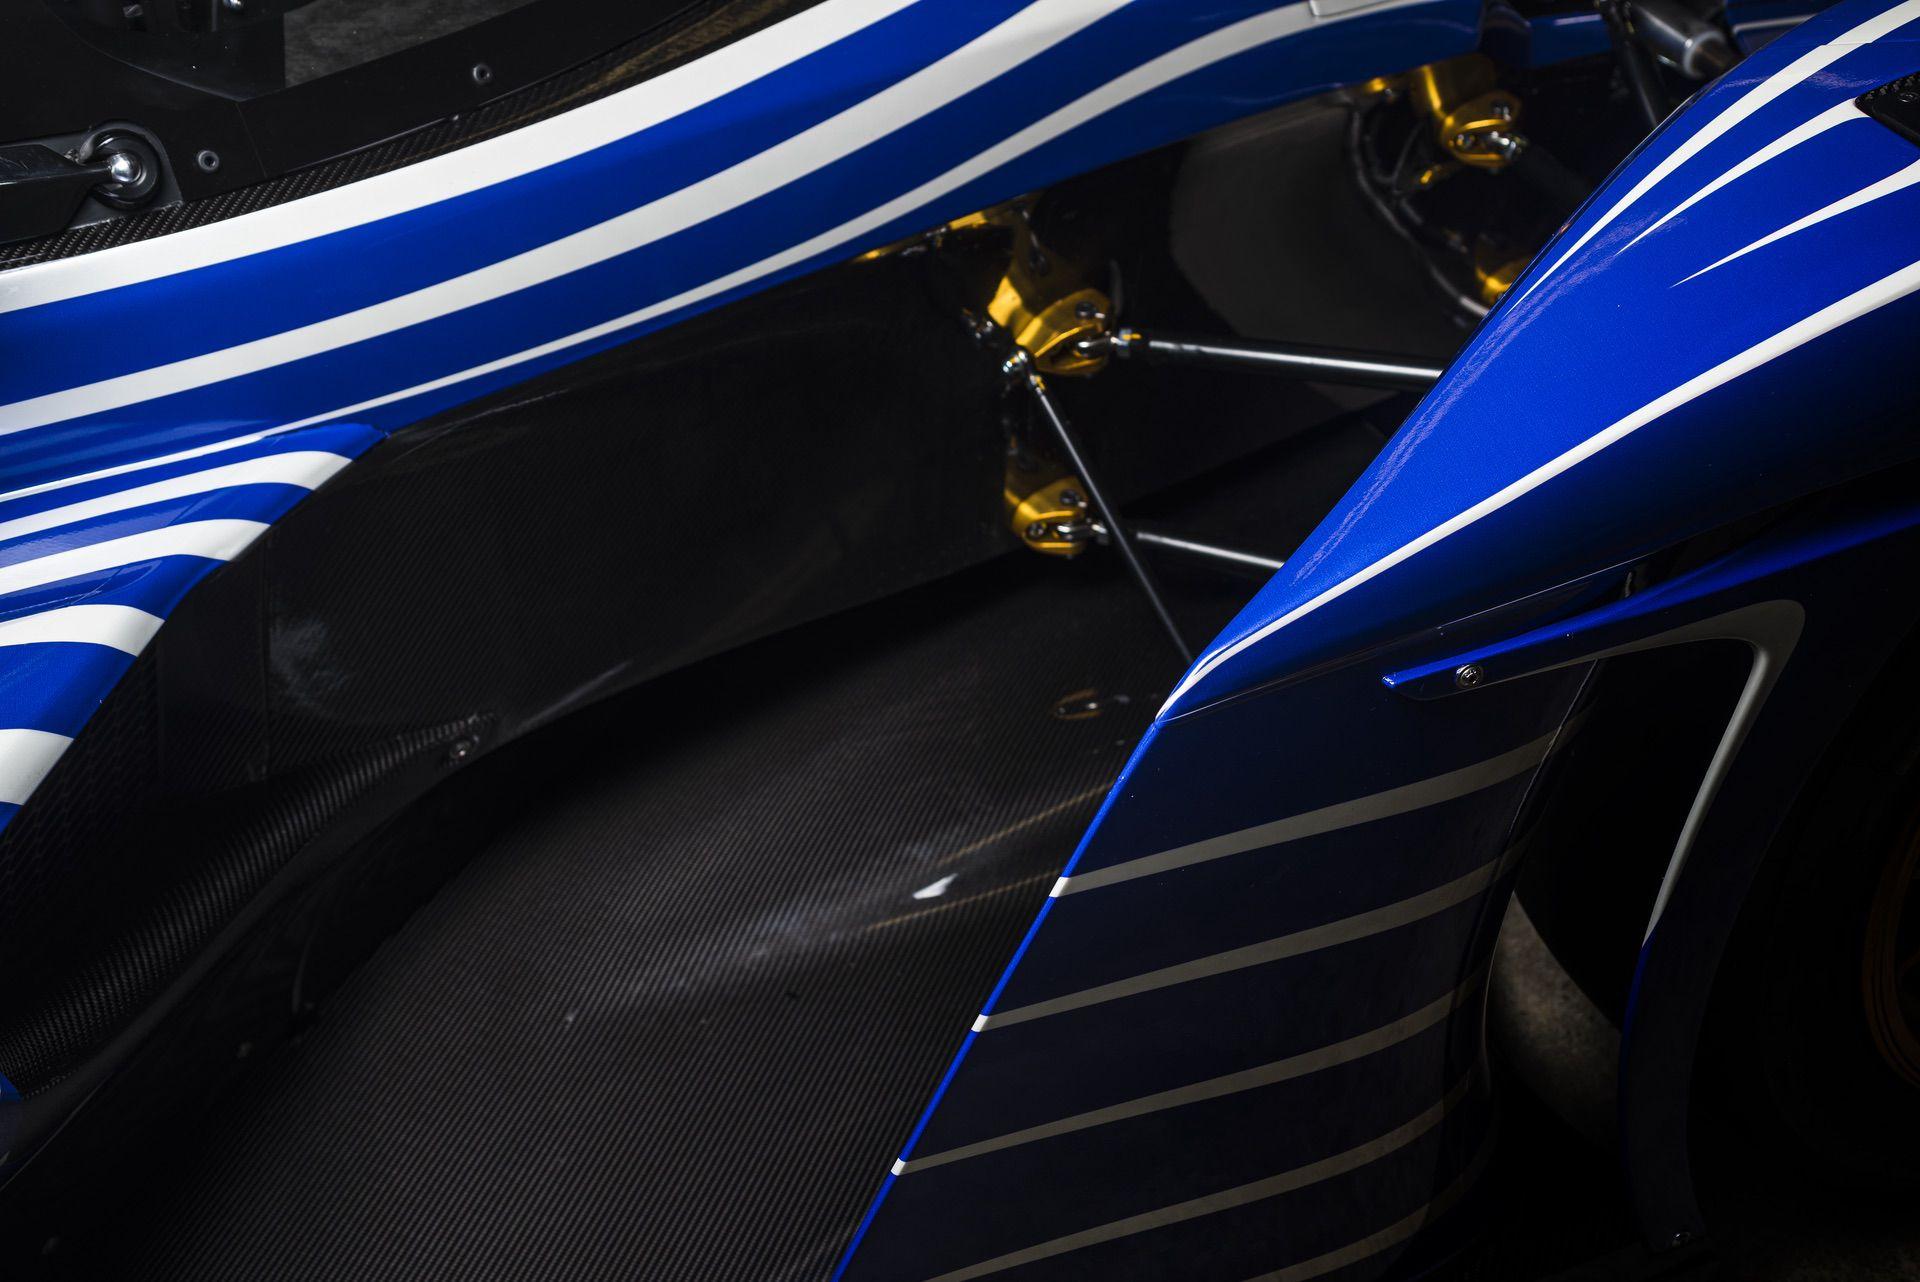 Praga_R1_Frank_Stephenson_racing_livery-0003